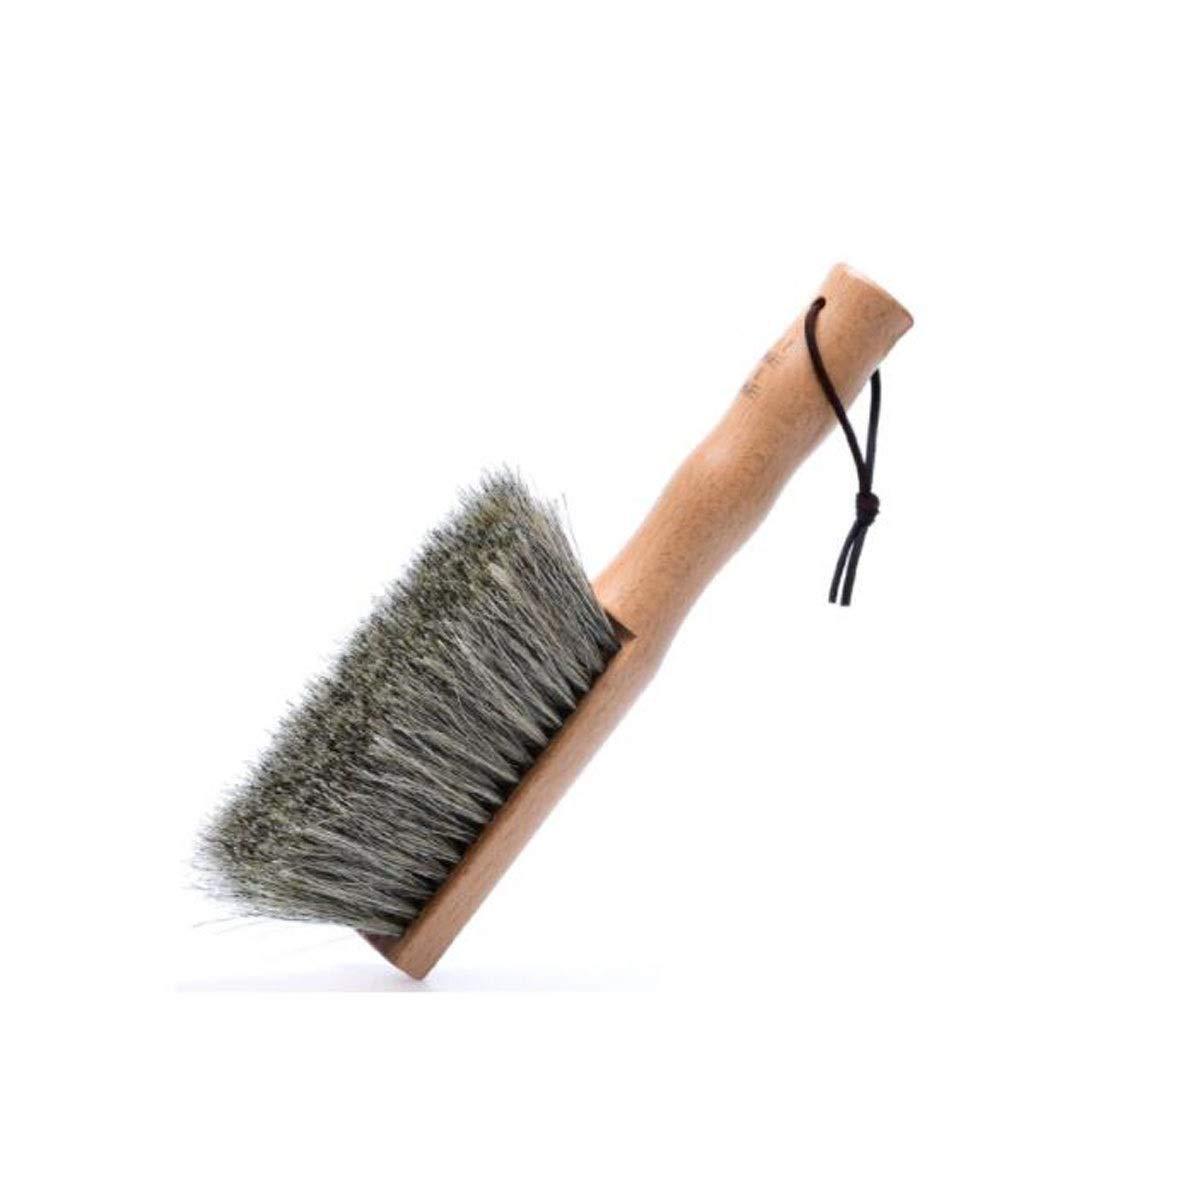 Tongboshi Horse Hair Sweeping Brush, Dusting Brush, Bedroom Soft Hair Sweeping Brush, Household Ash Removing Artifact, Eucalyptus Horse Hair Bed Brush Bed Brush (Edition : A)